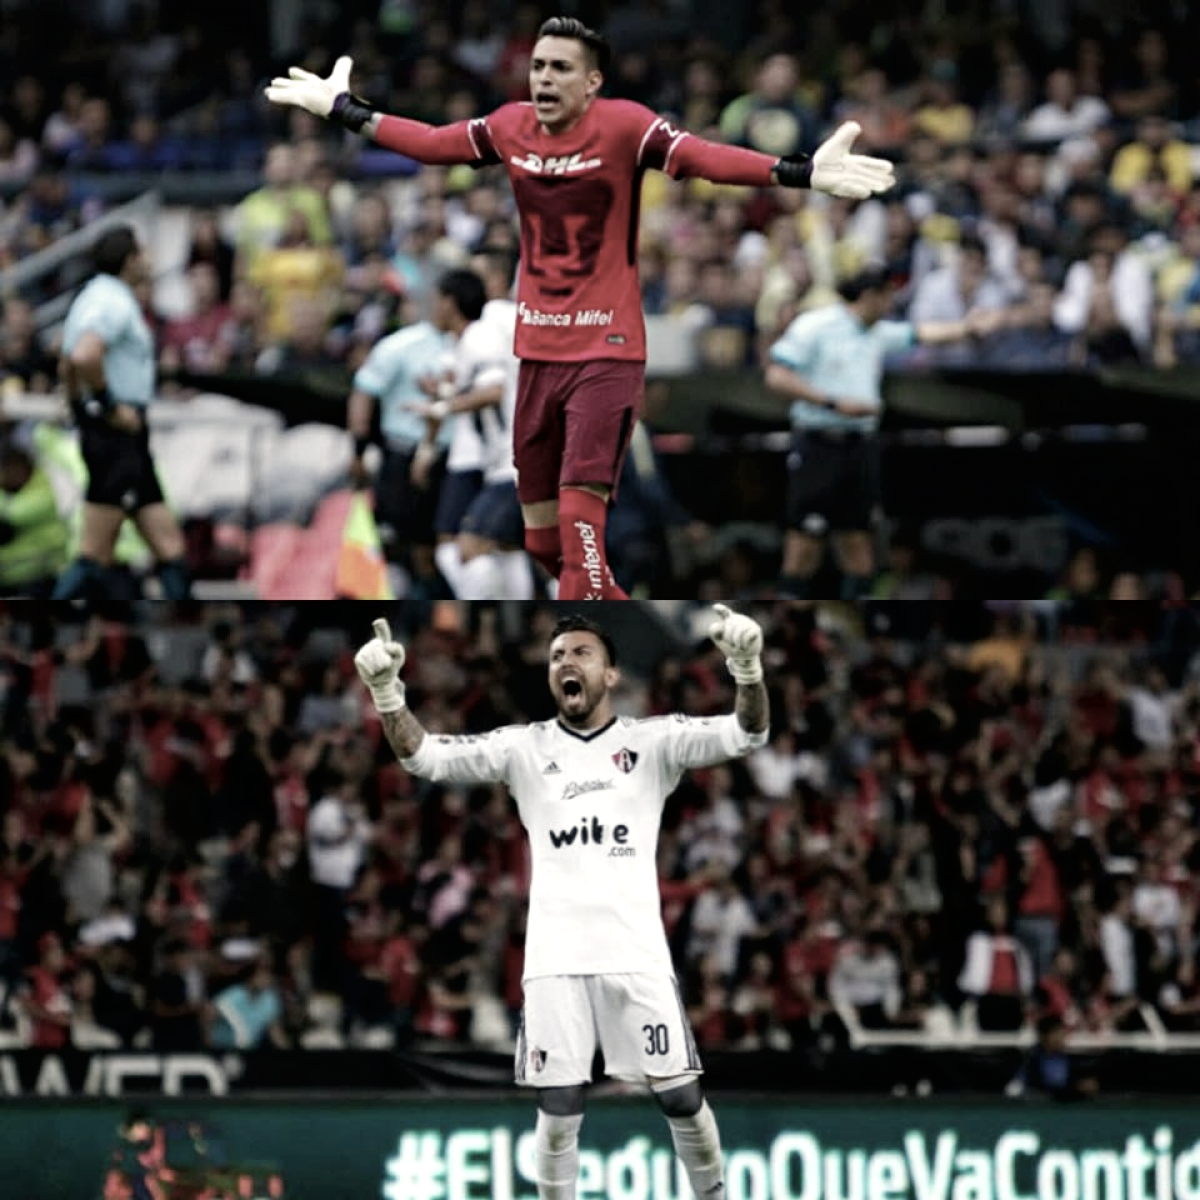 Saldívar vs Fraga, ¿quién será titular en el Apertura 2018?